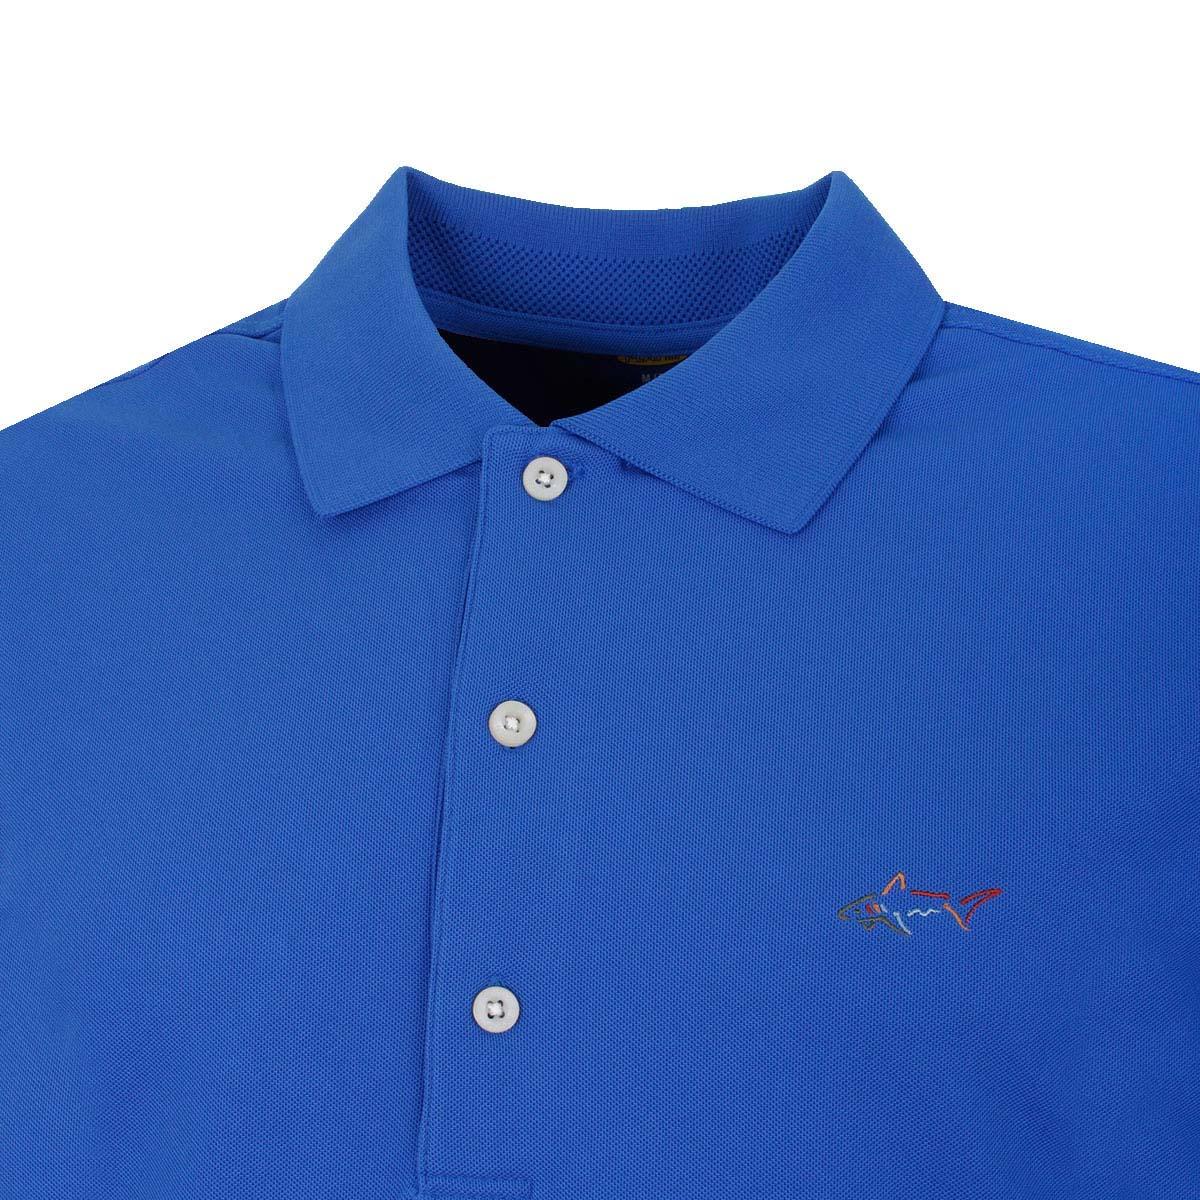 Greg-Norman-Mens-KX04-Performance-Micro-Pique-Golf-Polo-Shirt-28-OFF-RRP thumbnail 48